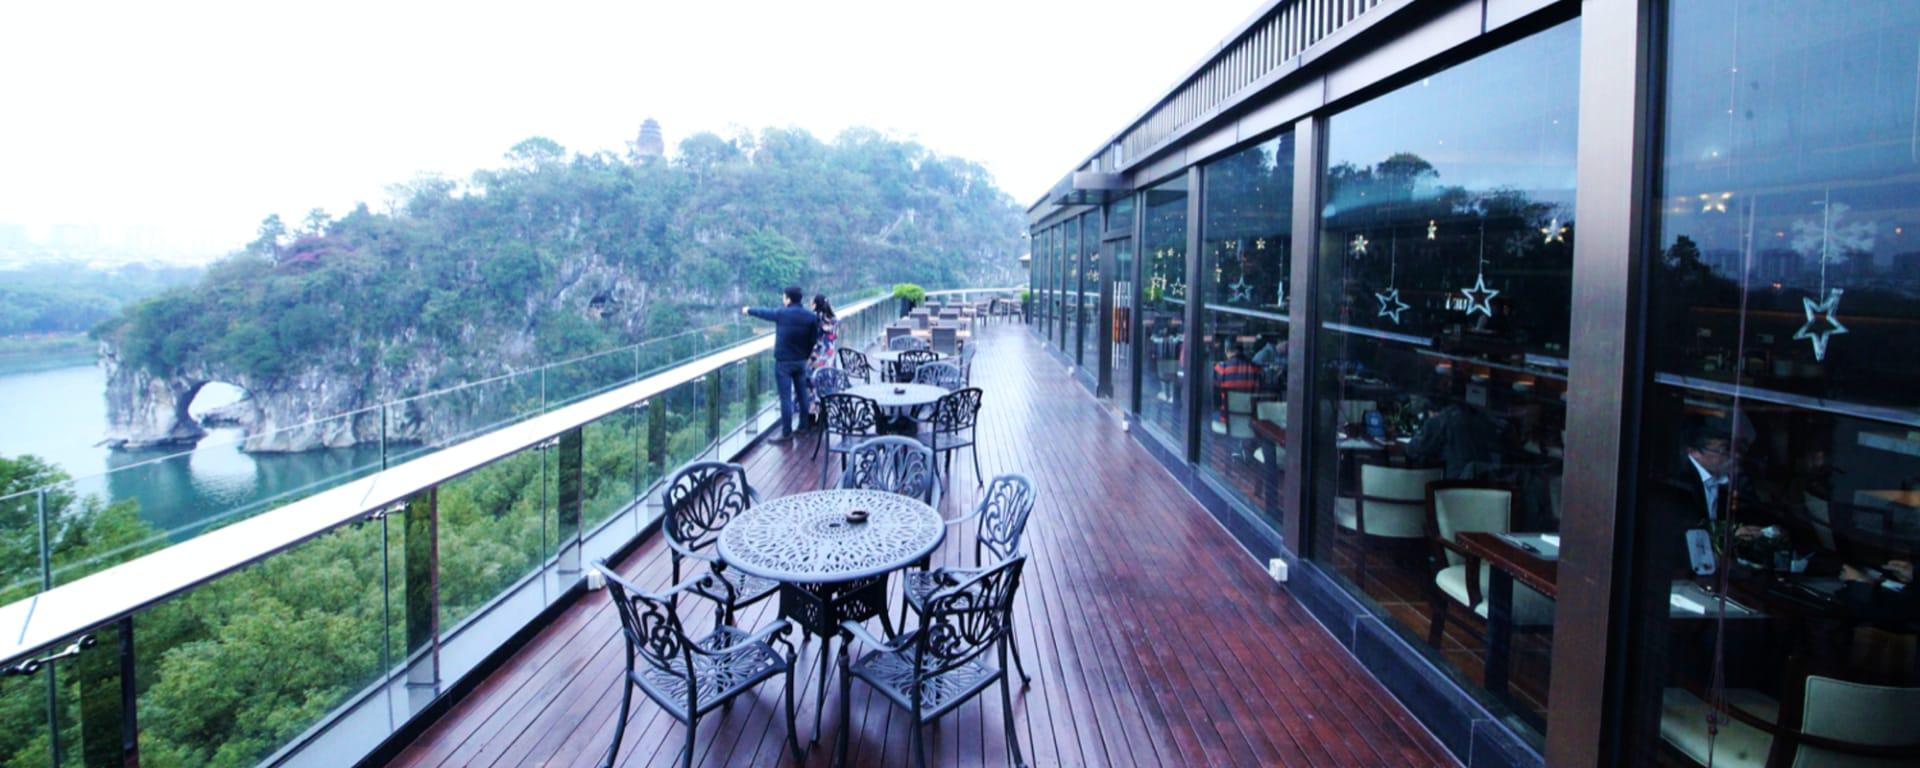 Jolie Vue Boutique Hotel in Guilin: Restaurant & Bar